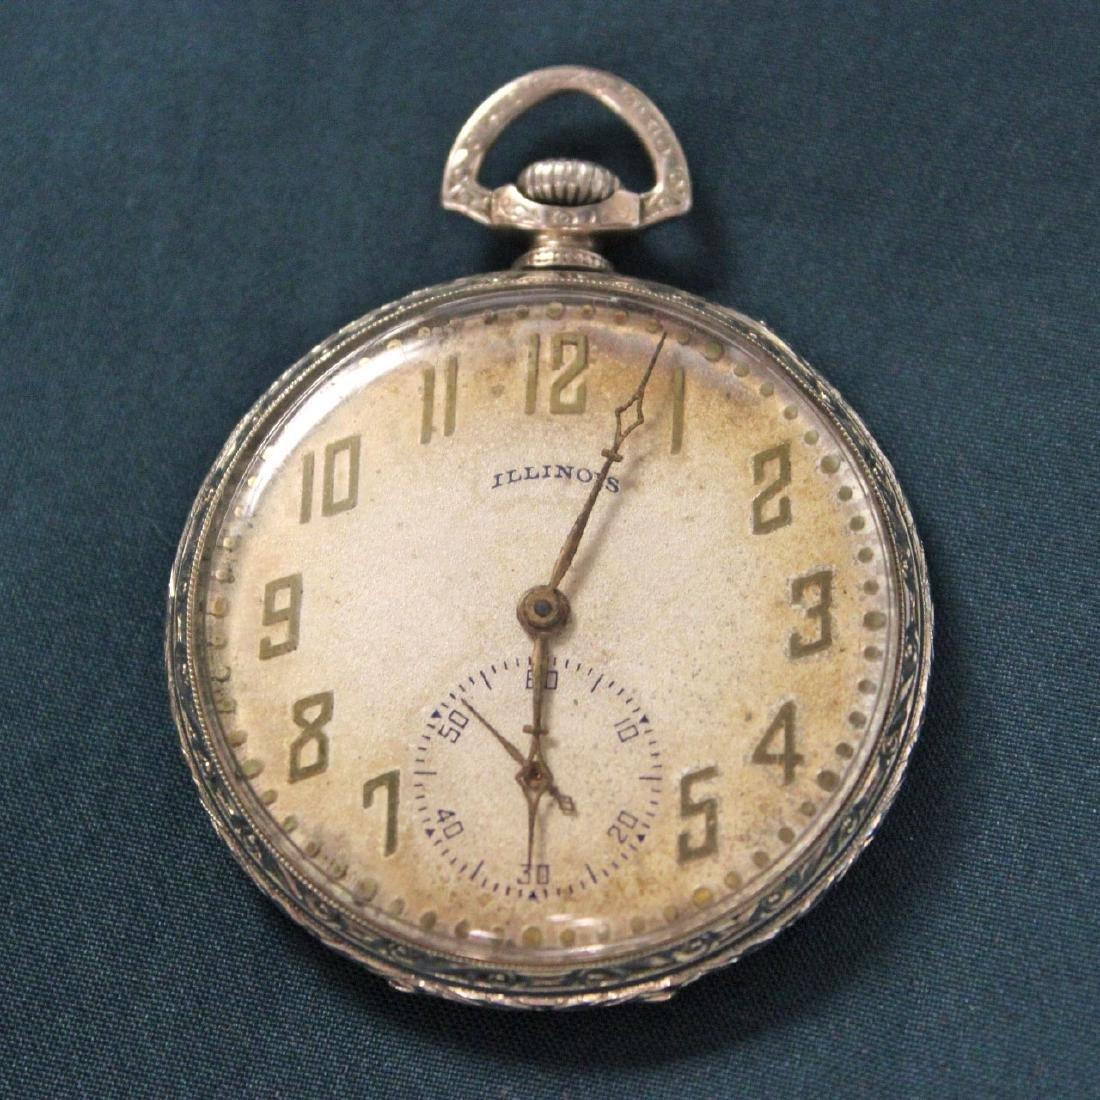 Antique Illinois Pocket Watch 17 Jewel Pocket Watch